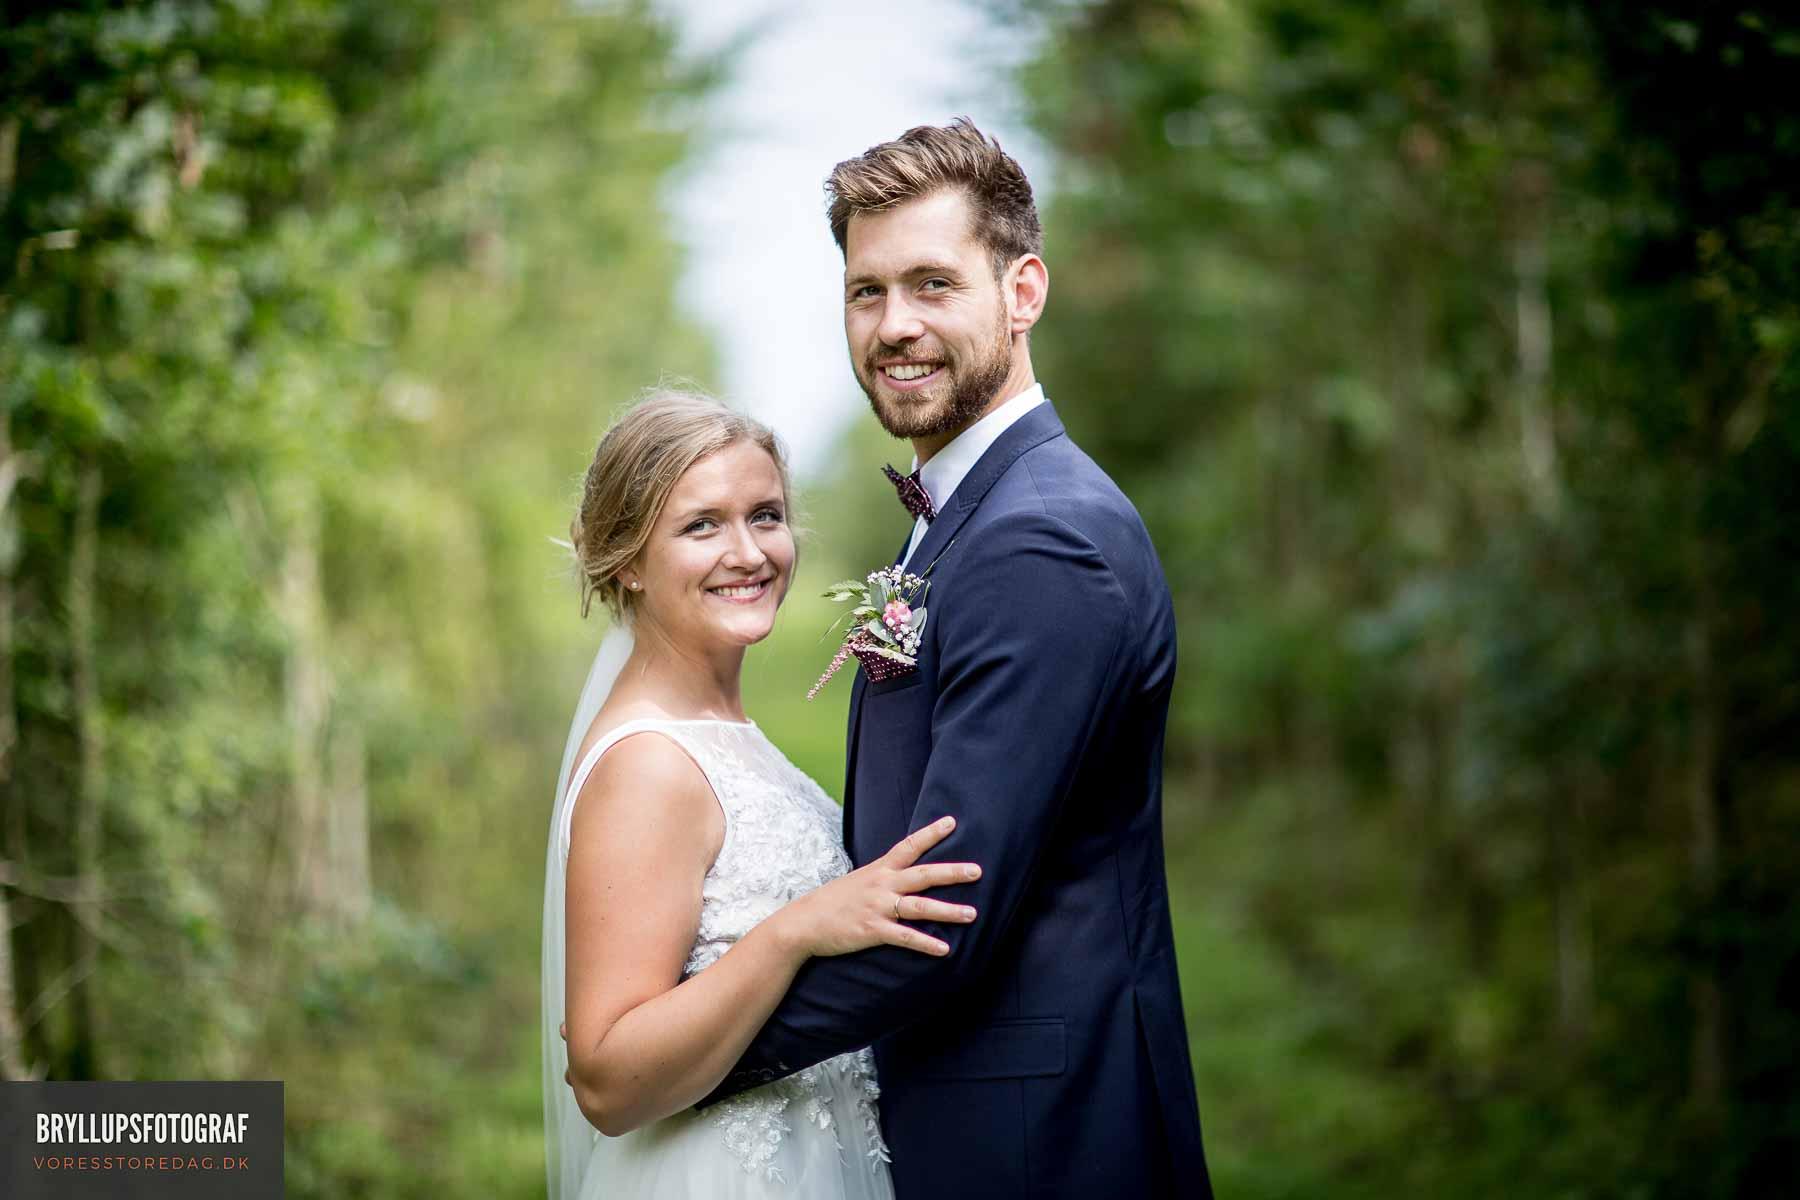 Bryllupsfotograf Kolding